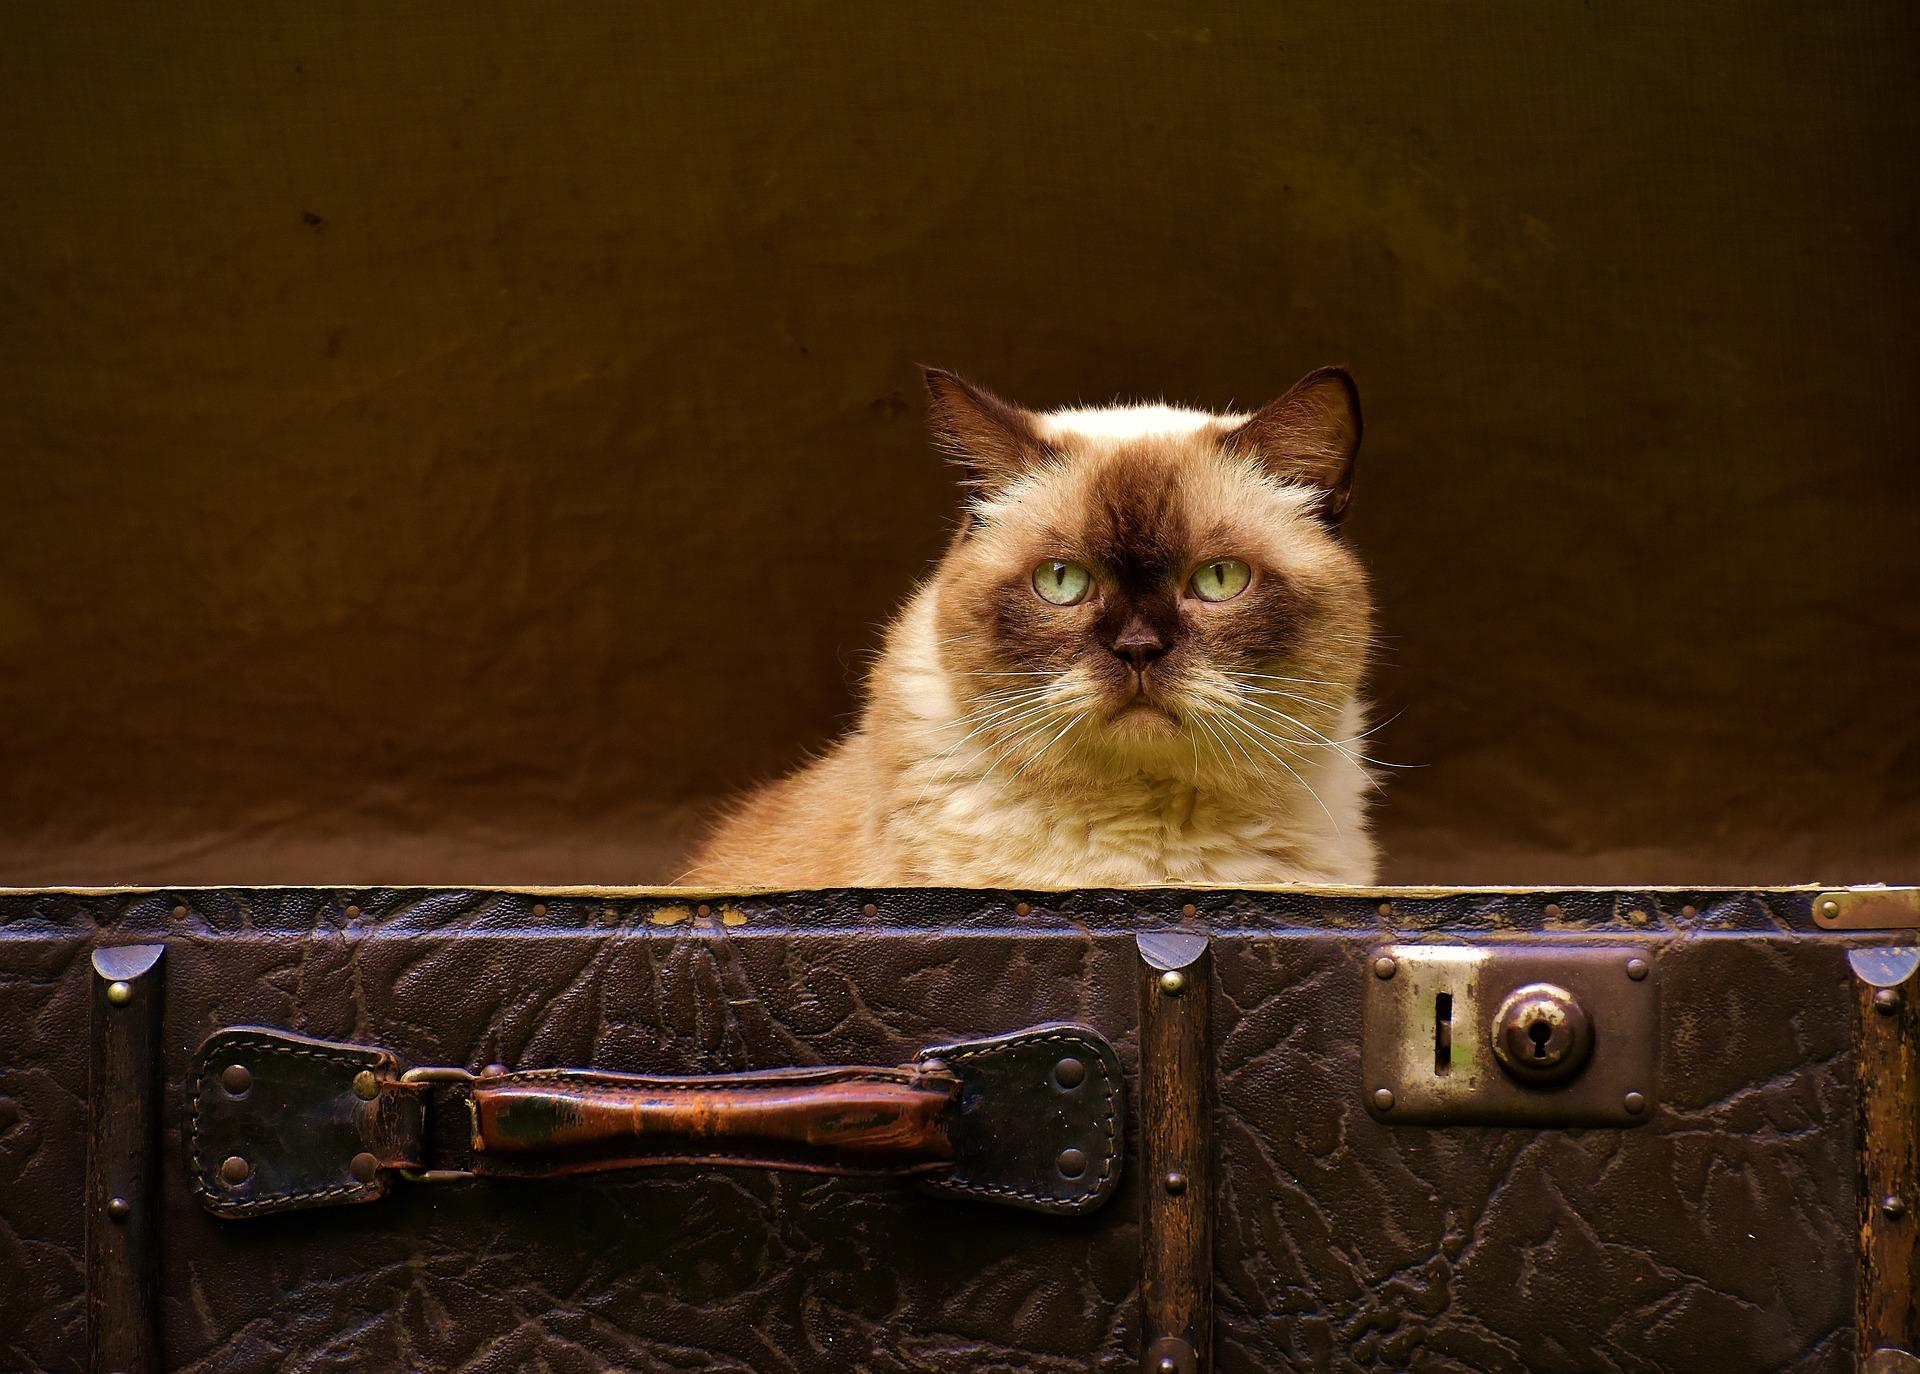 luggage-1645271_1920.jpg